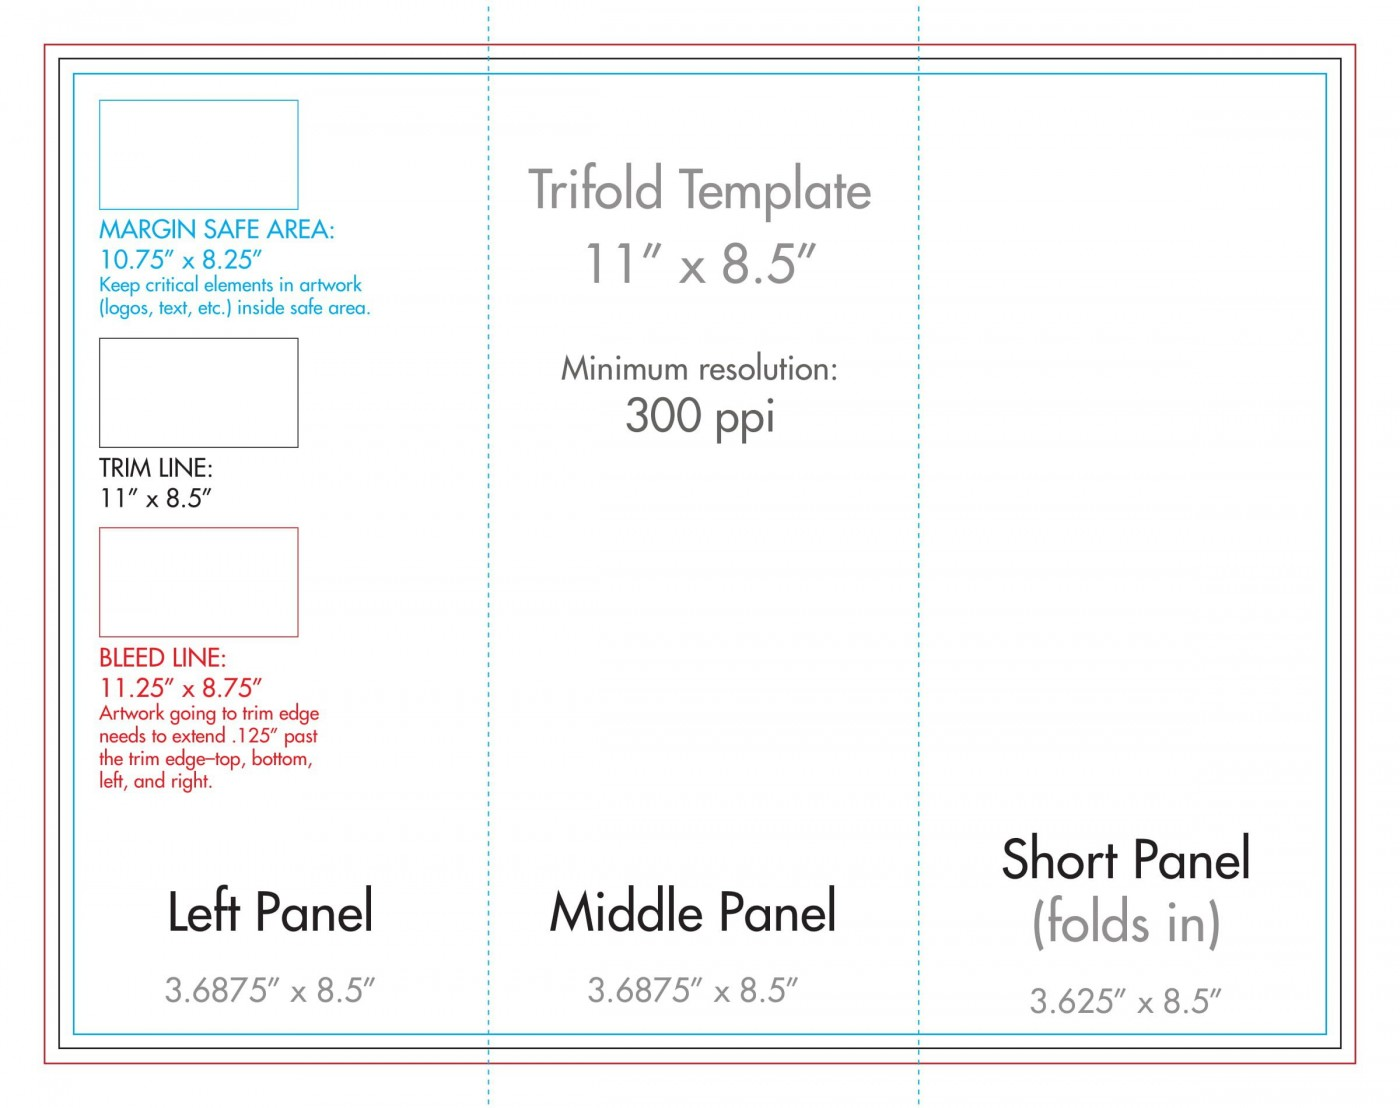 007 Wondrou 3 Fold Brochure Template Concept  For Free1400